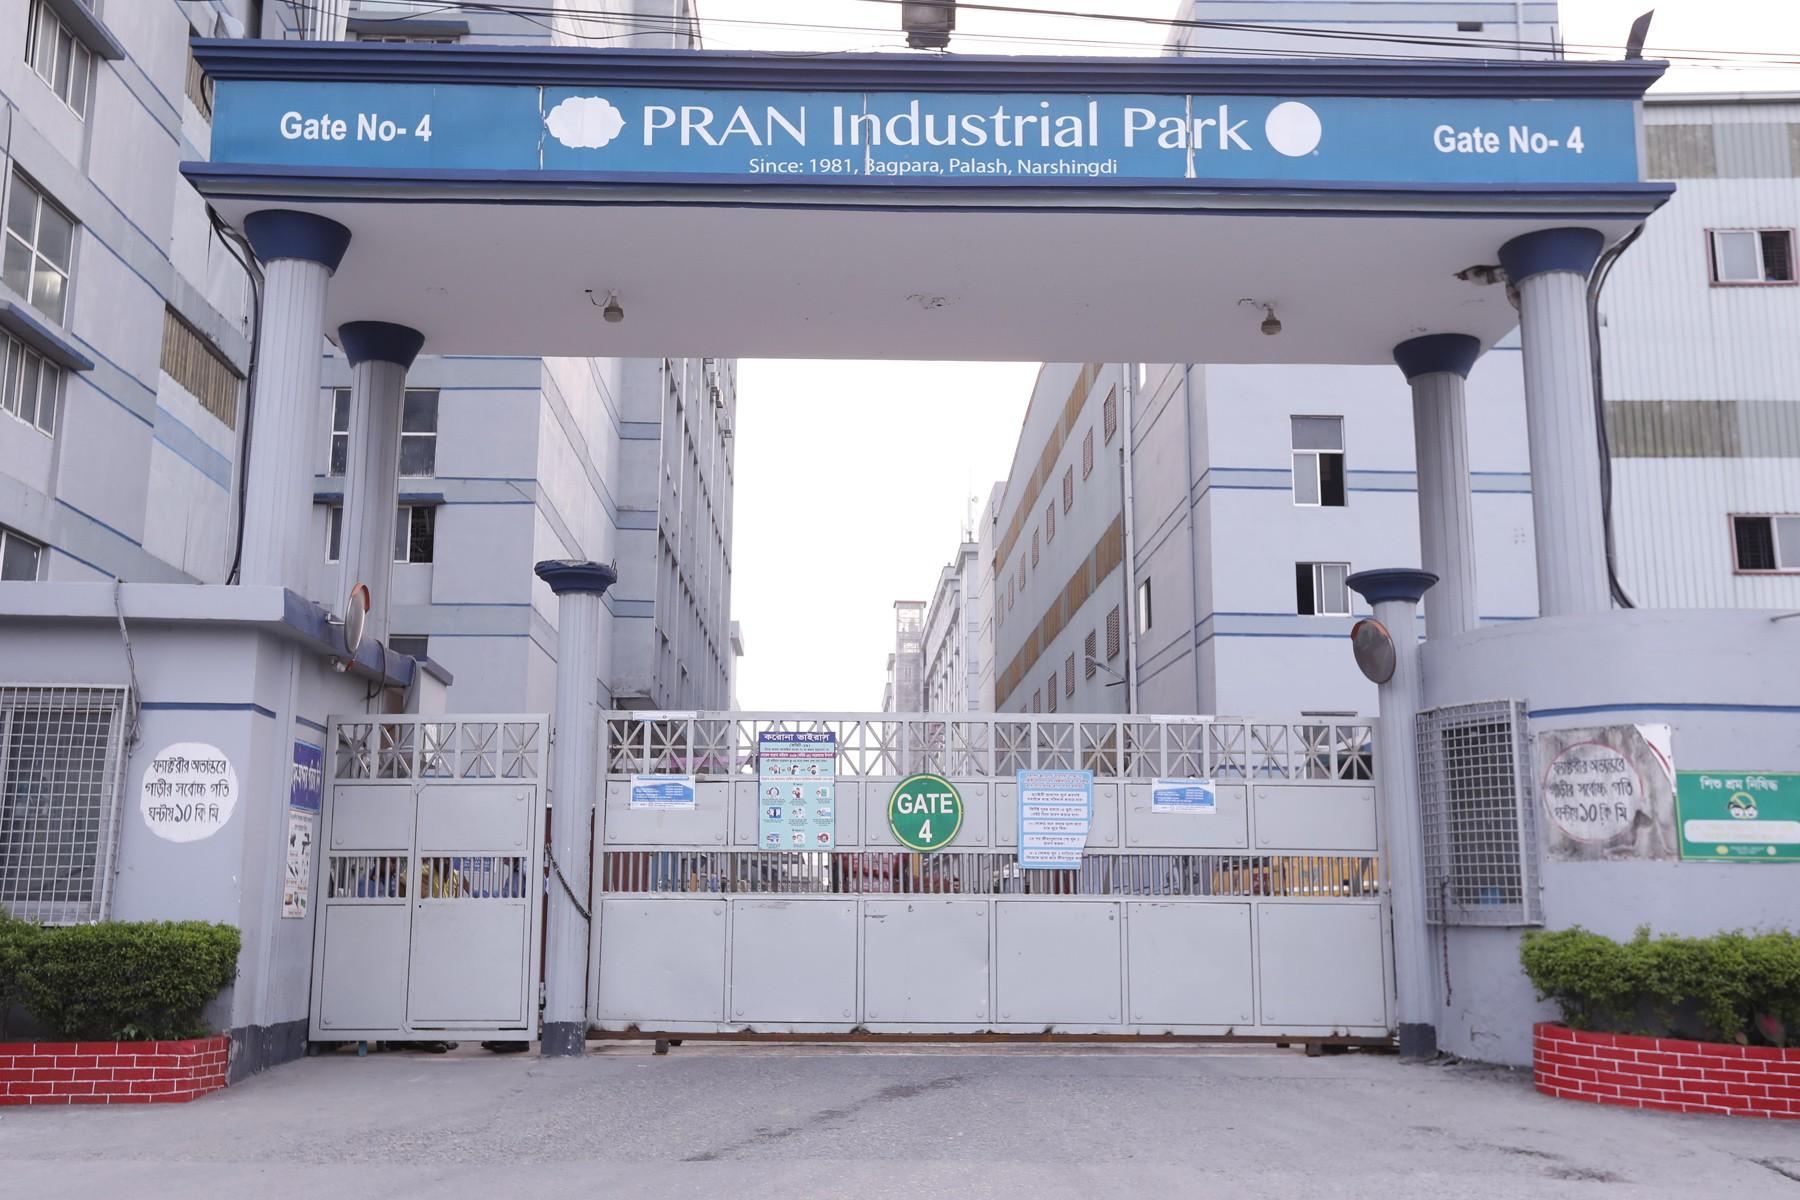 PRAN Industrial Park Factory Gate 1